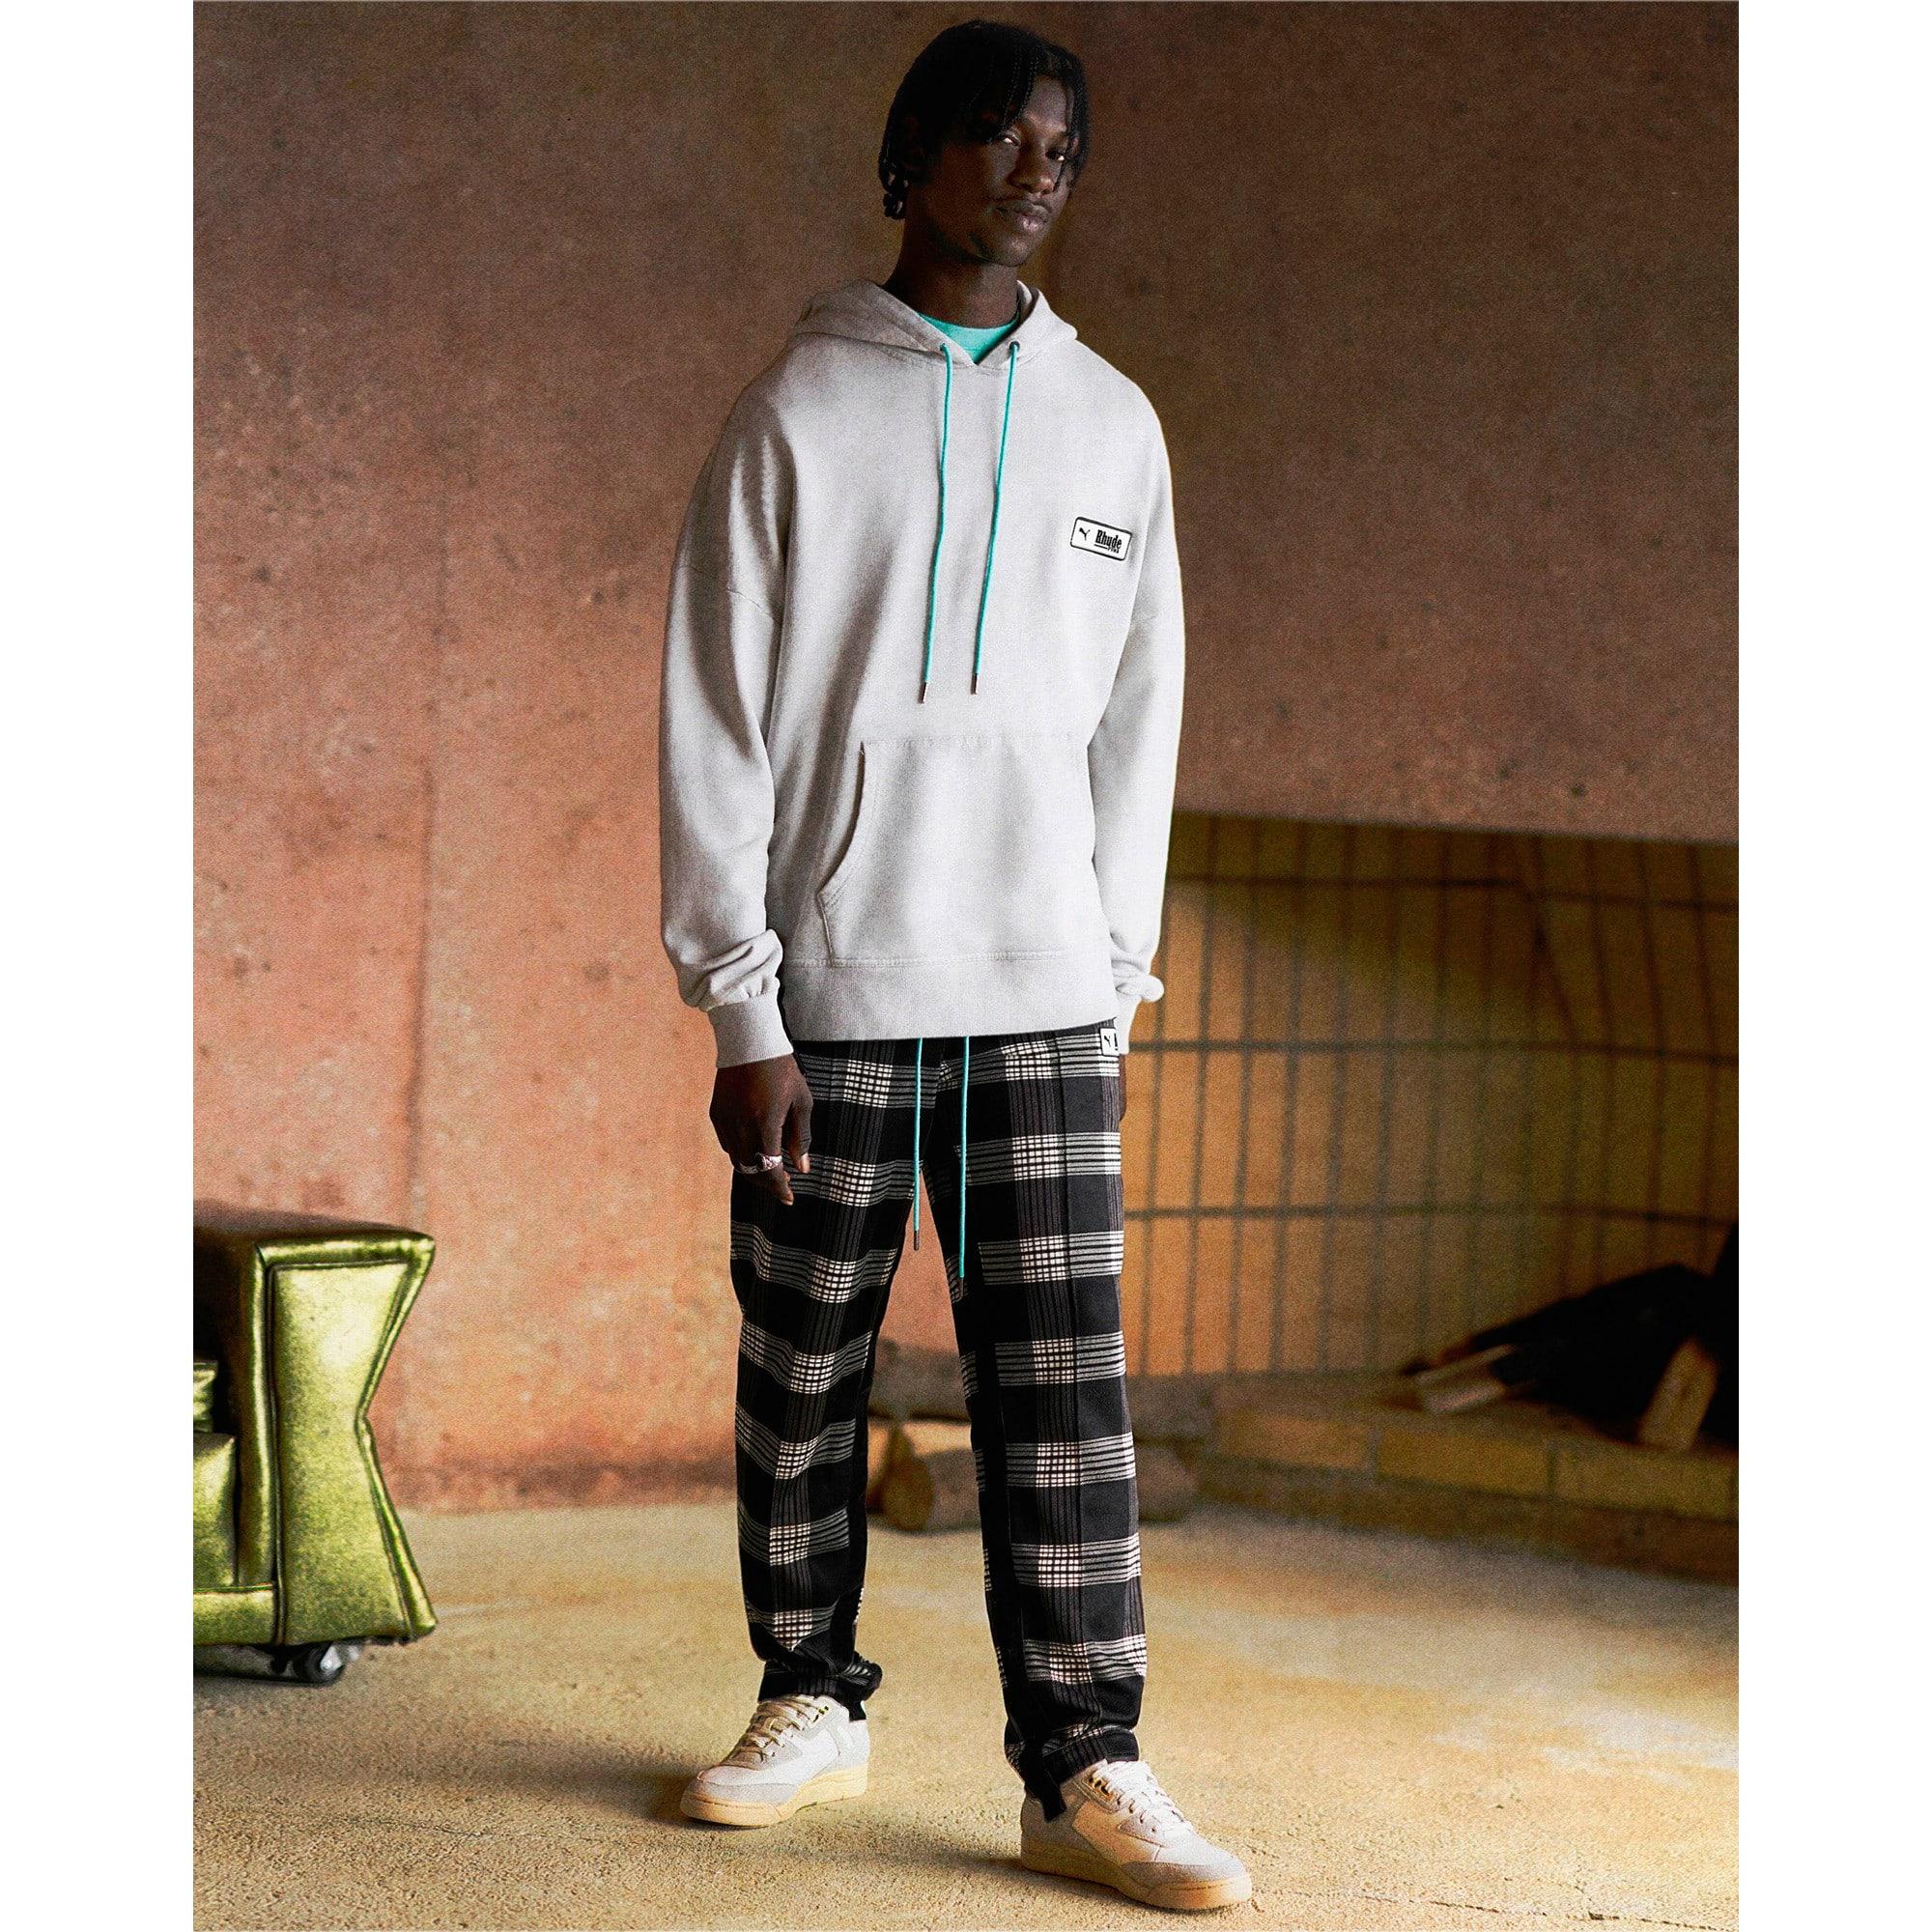 Anteprima 3 di PUMA x RHUDE All-Over Print Knitted Men's Track Pants, Puma White AOP, medio